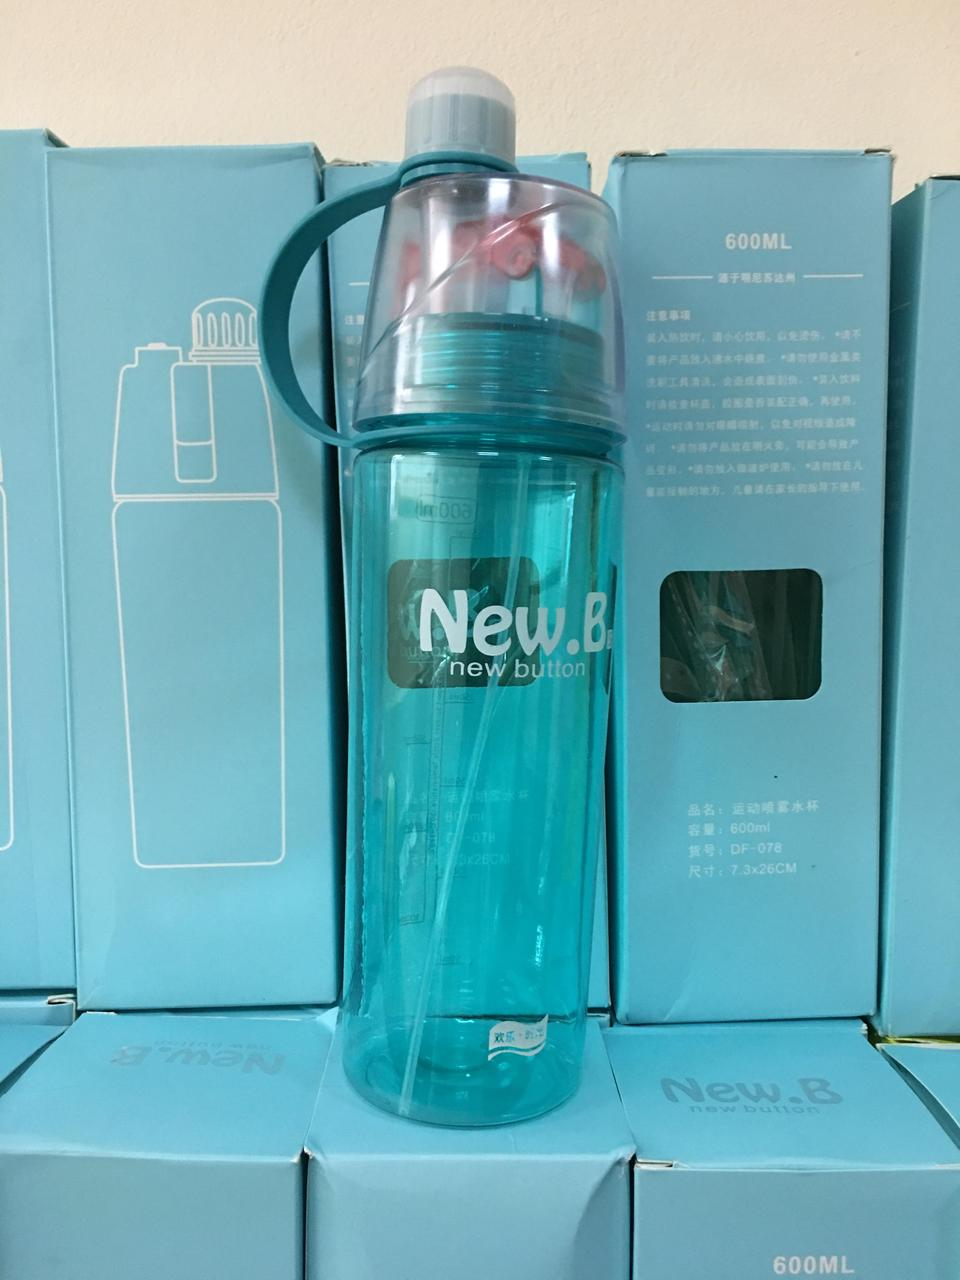 Спортивная фитнес спреер Бутылка New B. Green ( New Button Bottle) 600 мл c дозатором и шкалой Уценка